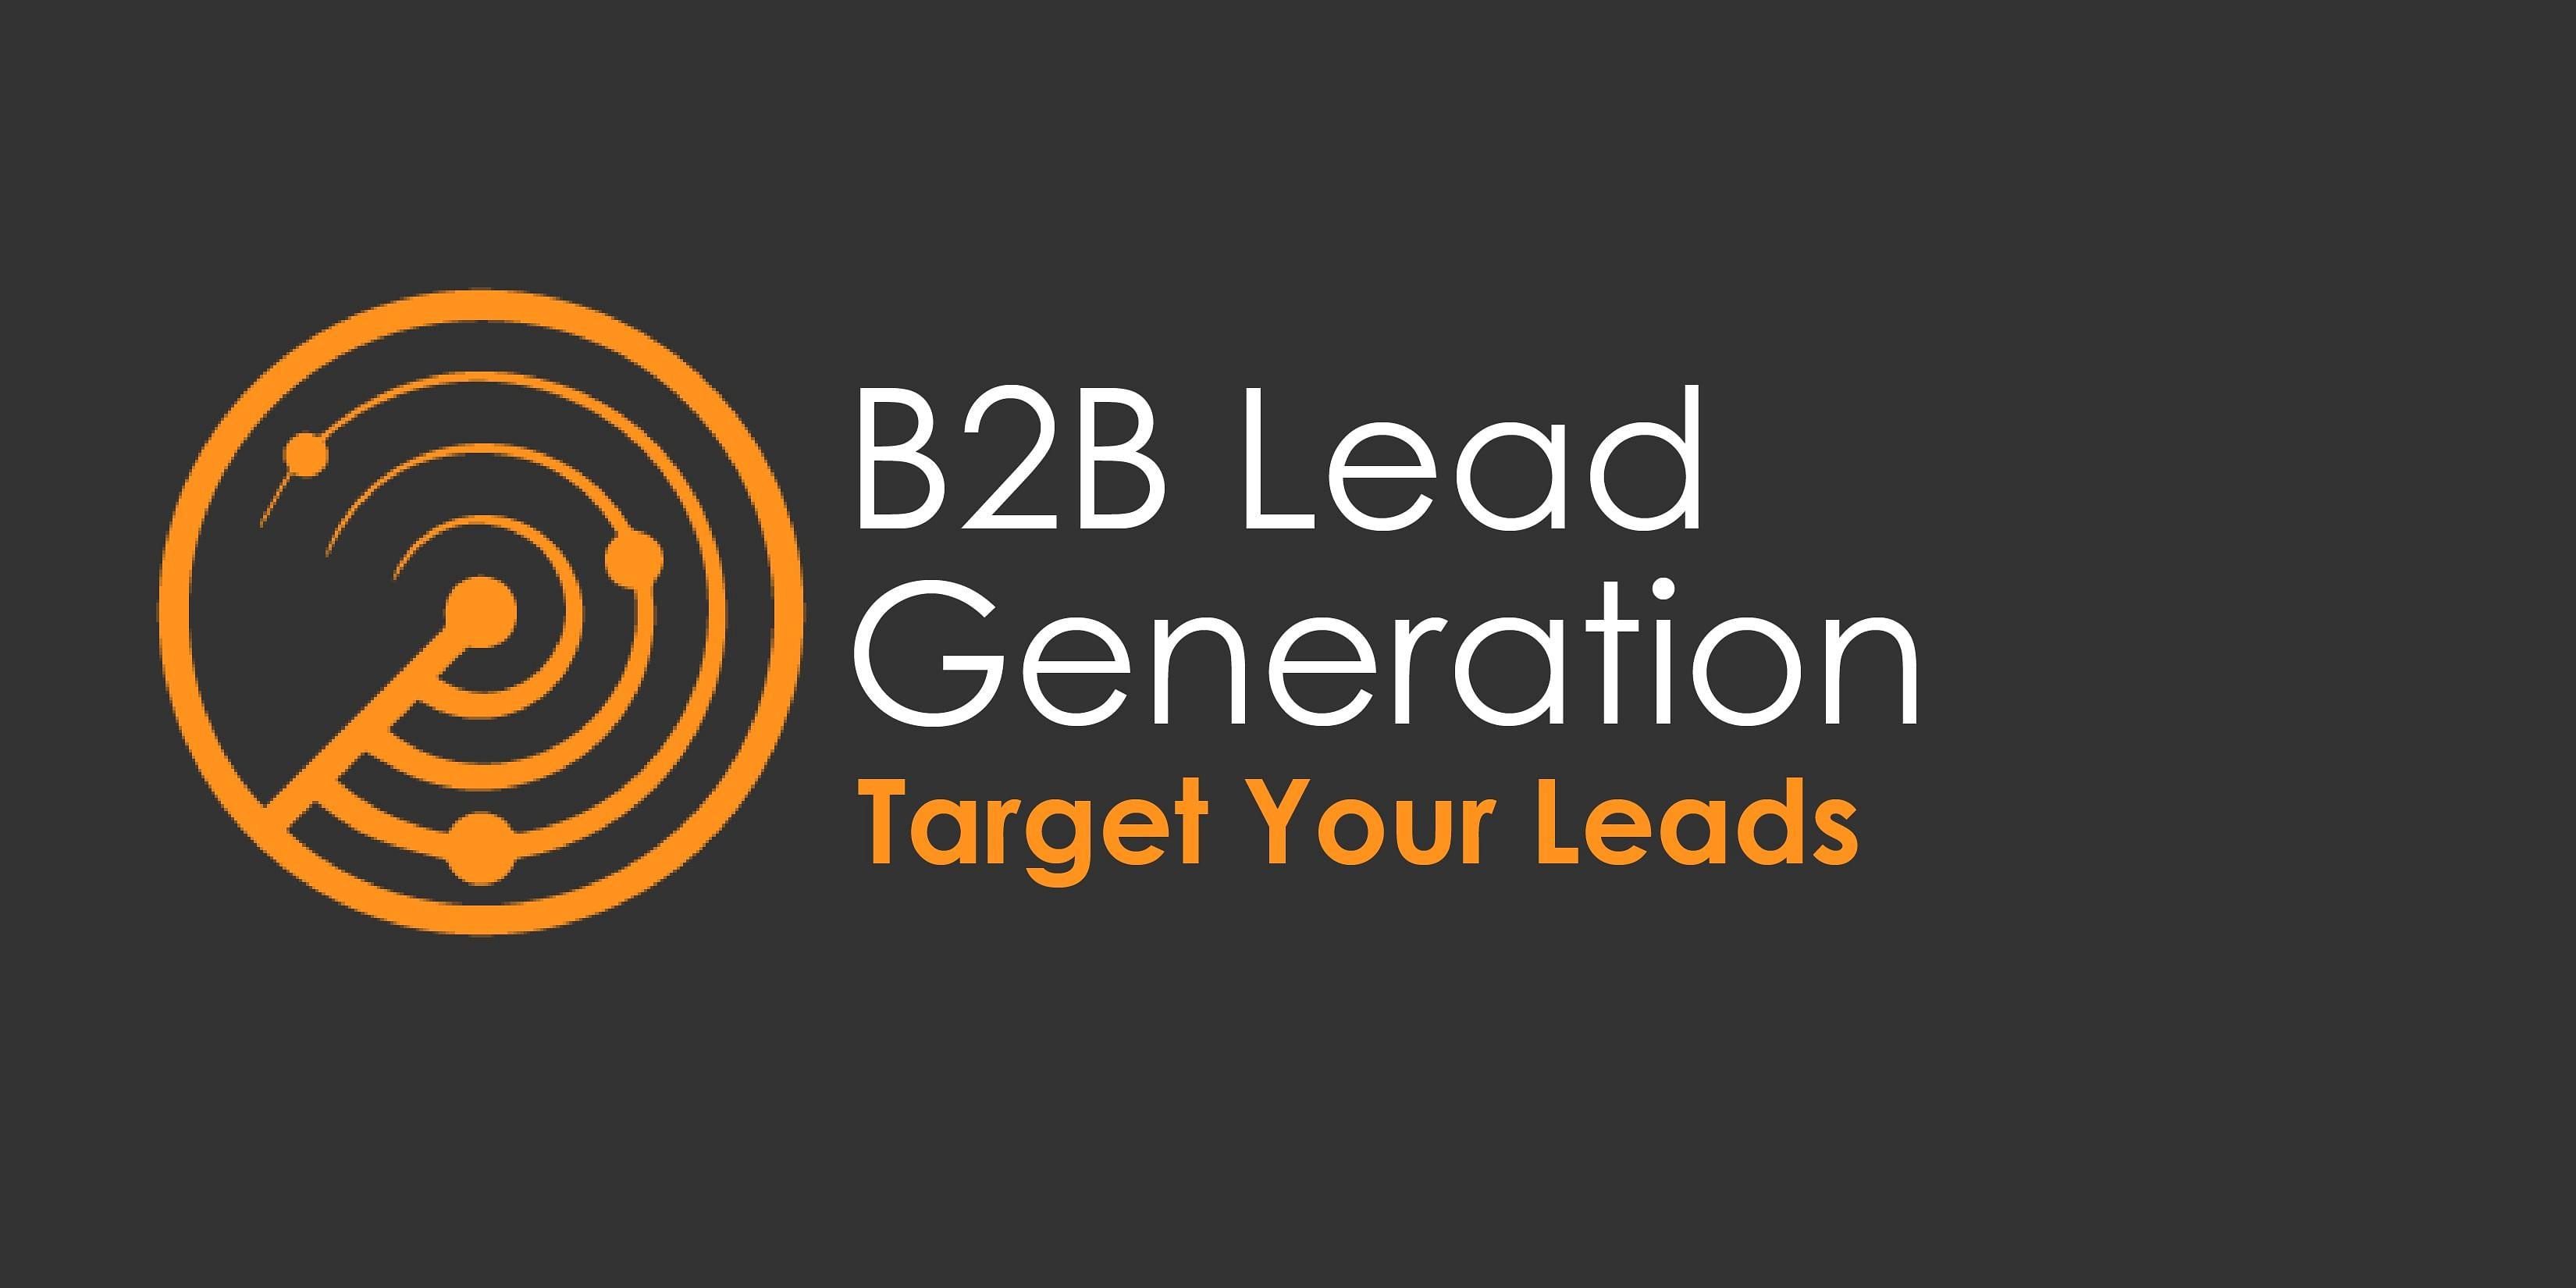 B 2 B Lead Generation Services